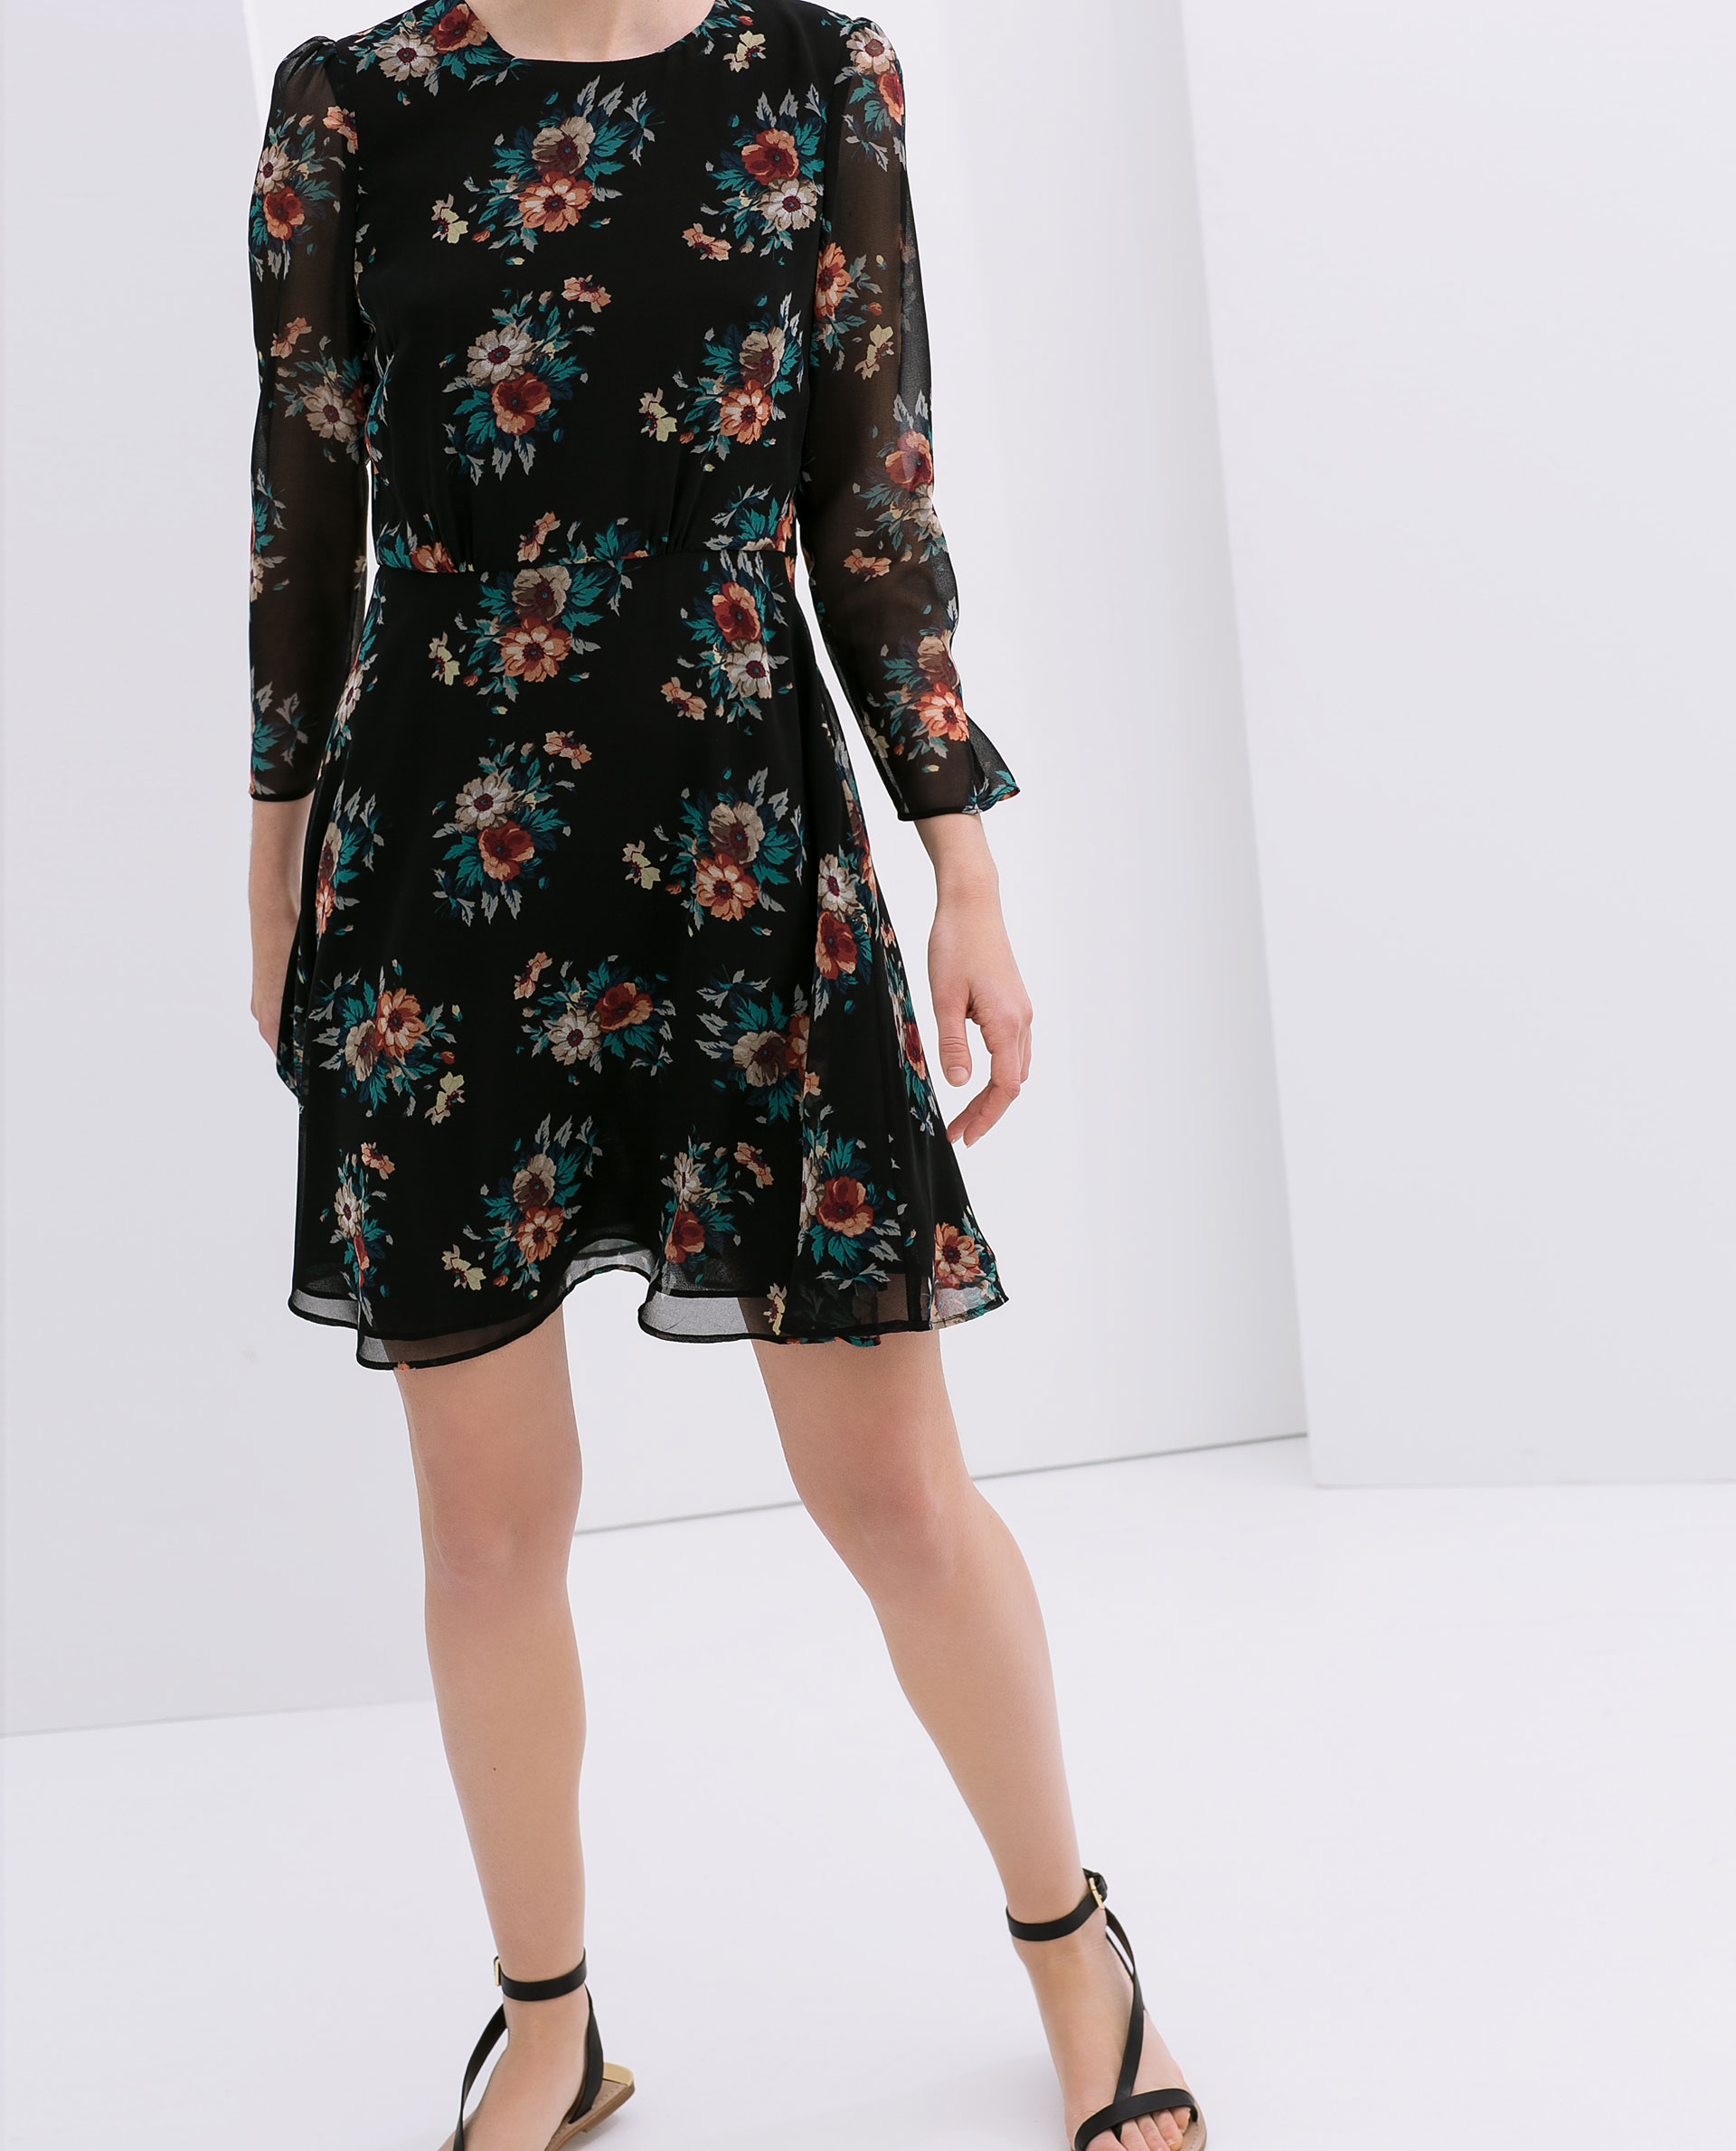 Zara Floral Print Dress In Black Lyst